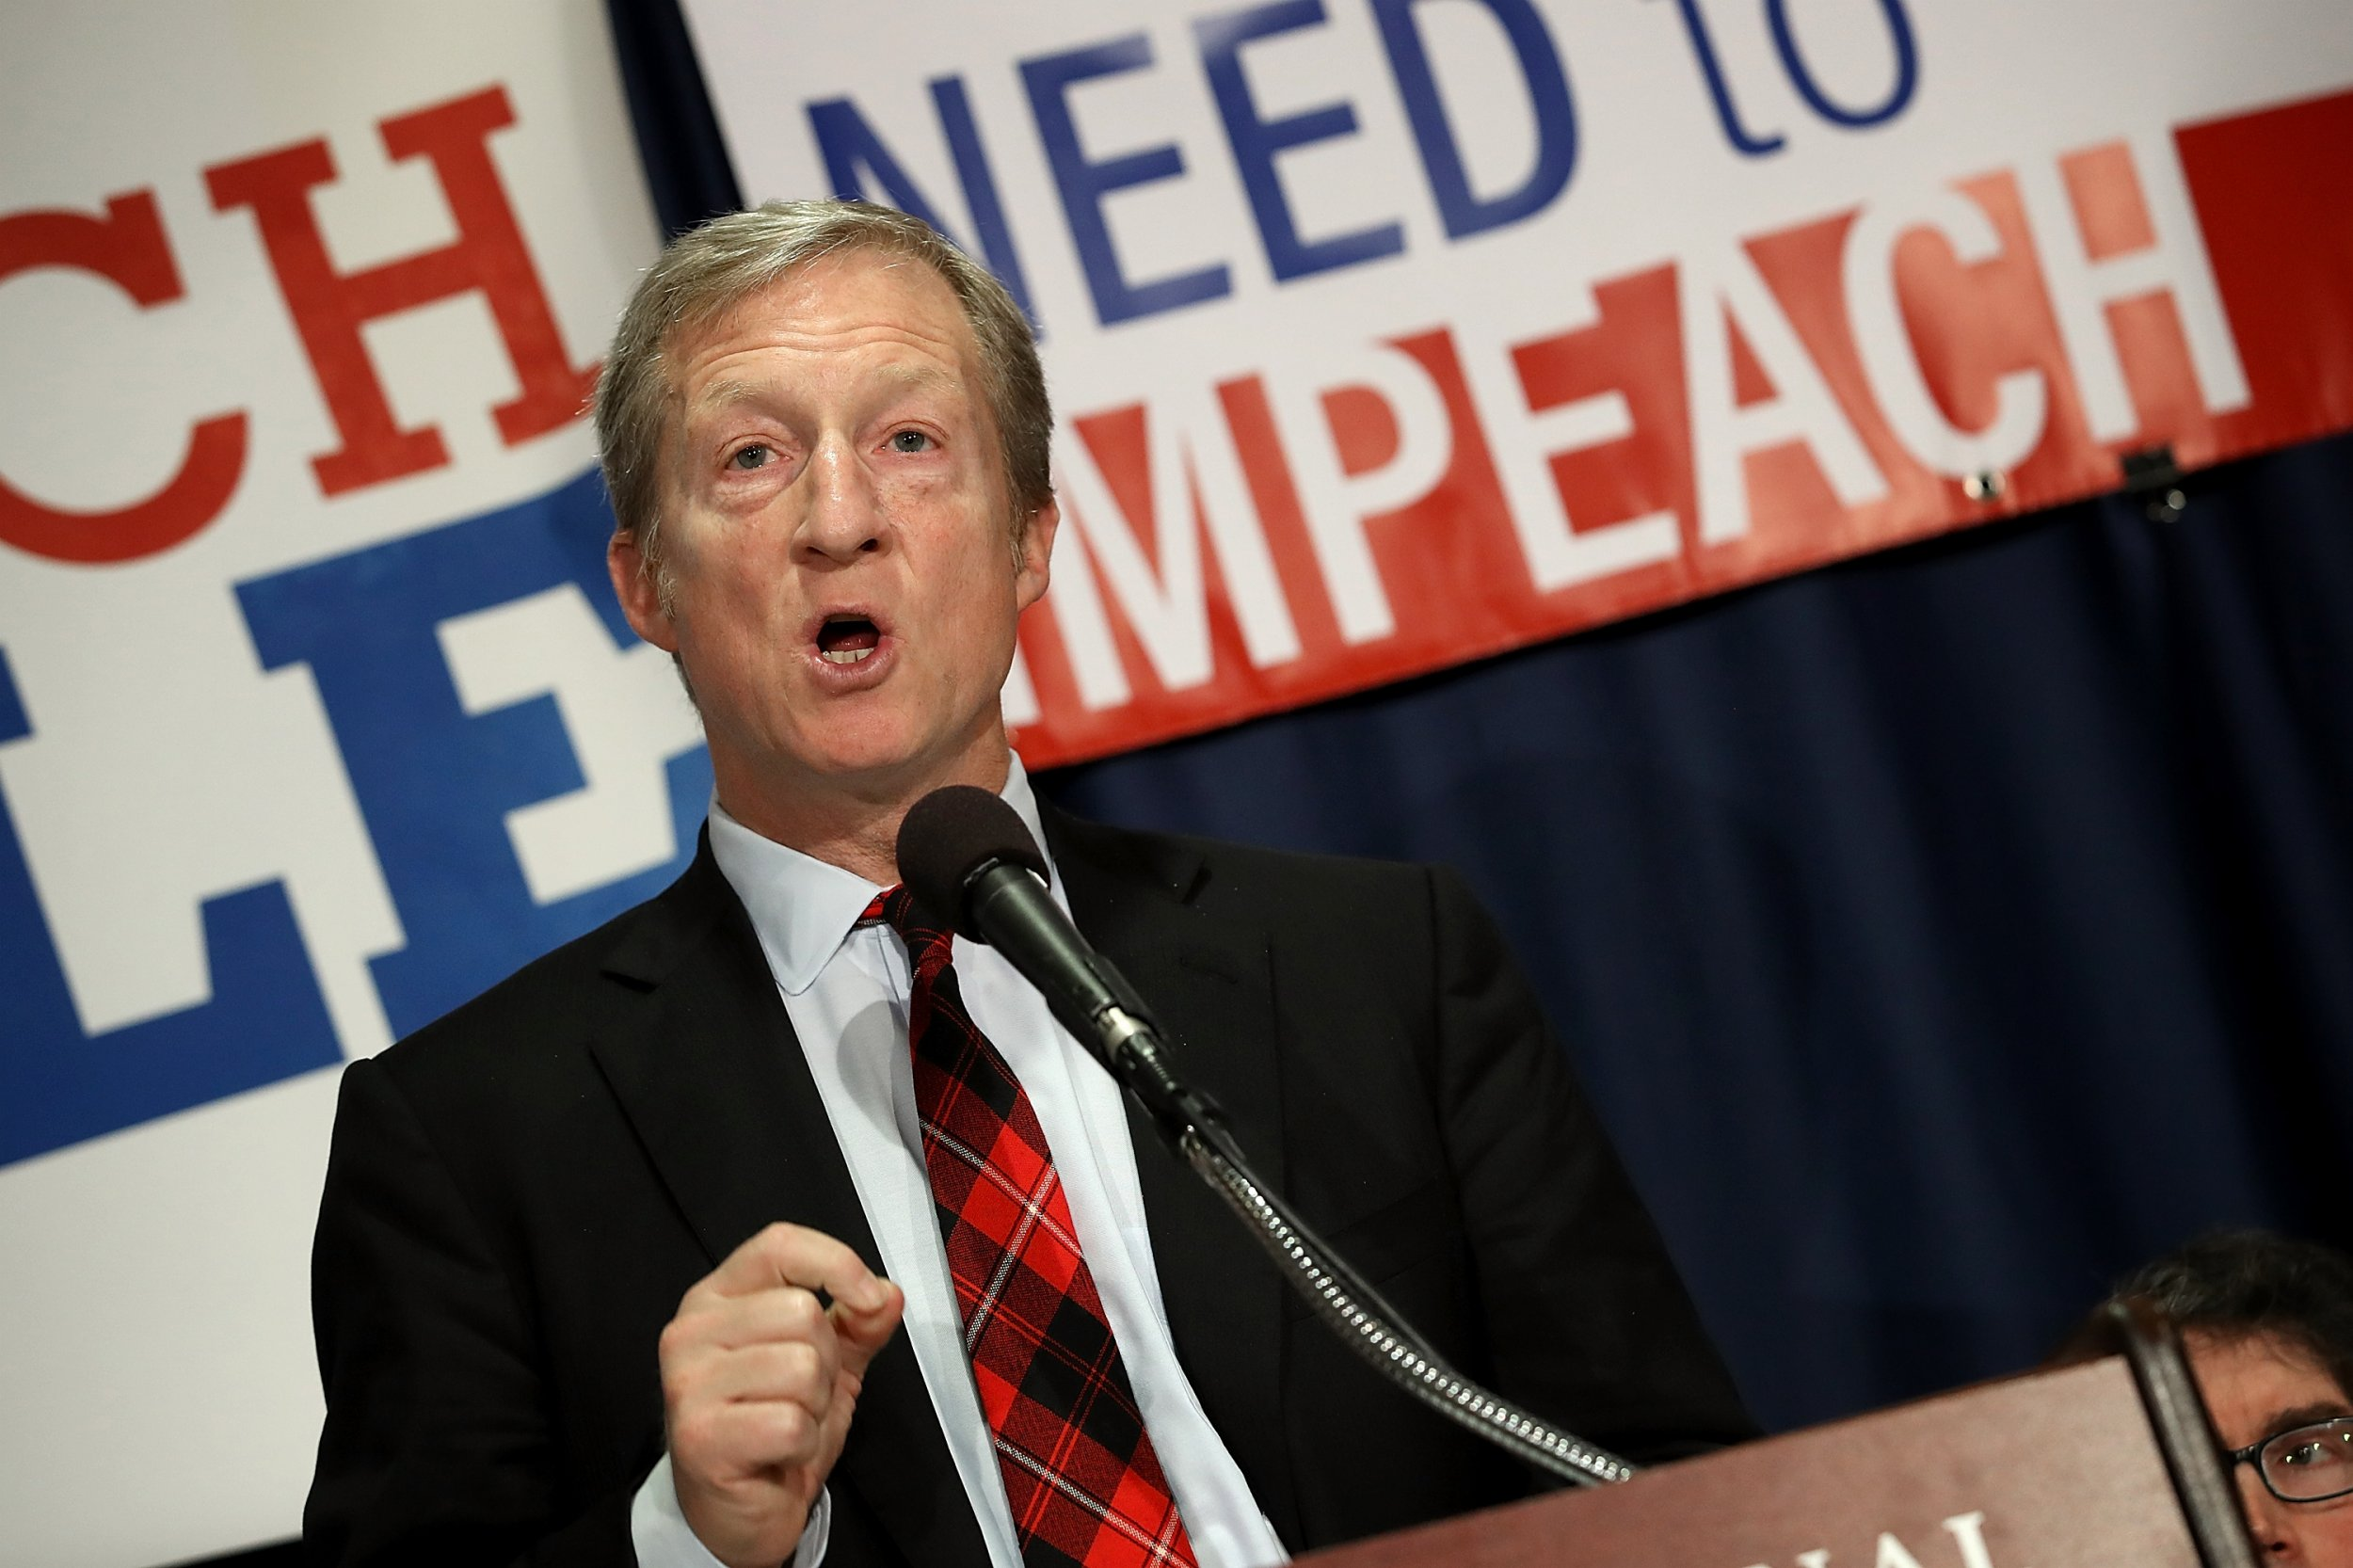 tom steyer, 2020, election, impeachment, donald trump